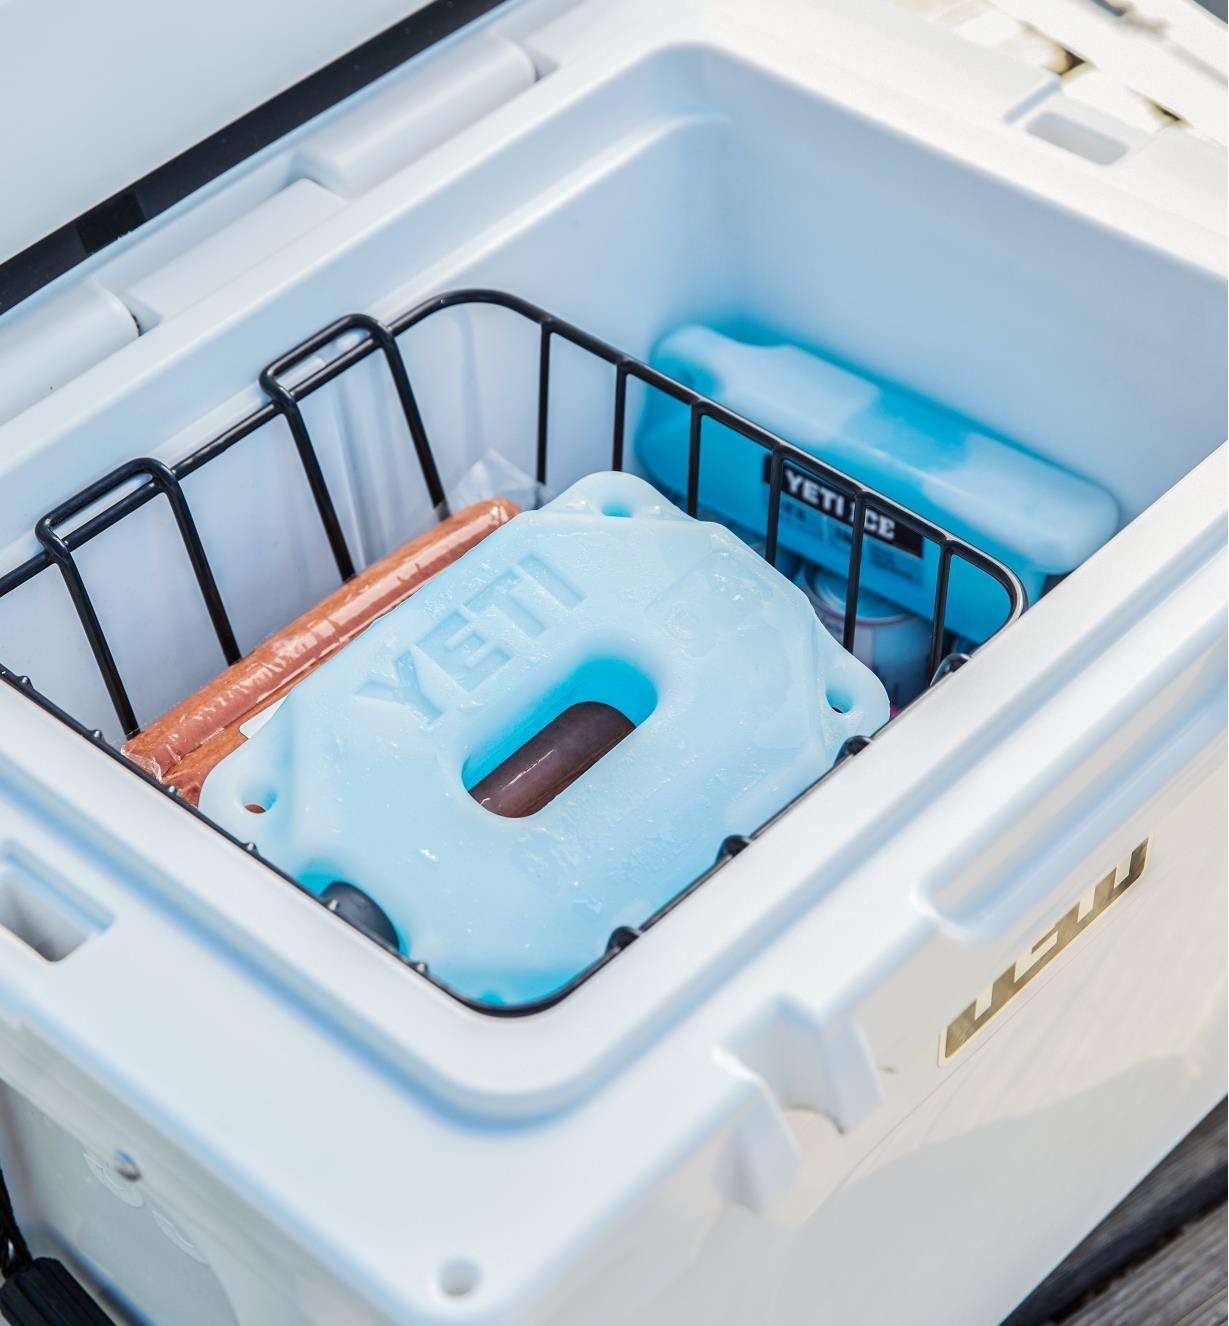 "74K0090 - 1 lb Yeti Ice Pack, 8"" x 2 5/8"" x 1 9/16"""